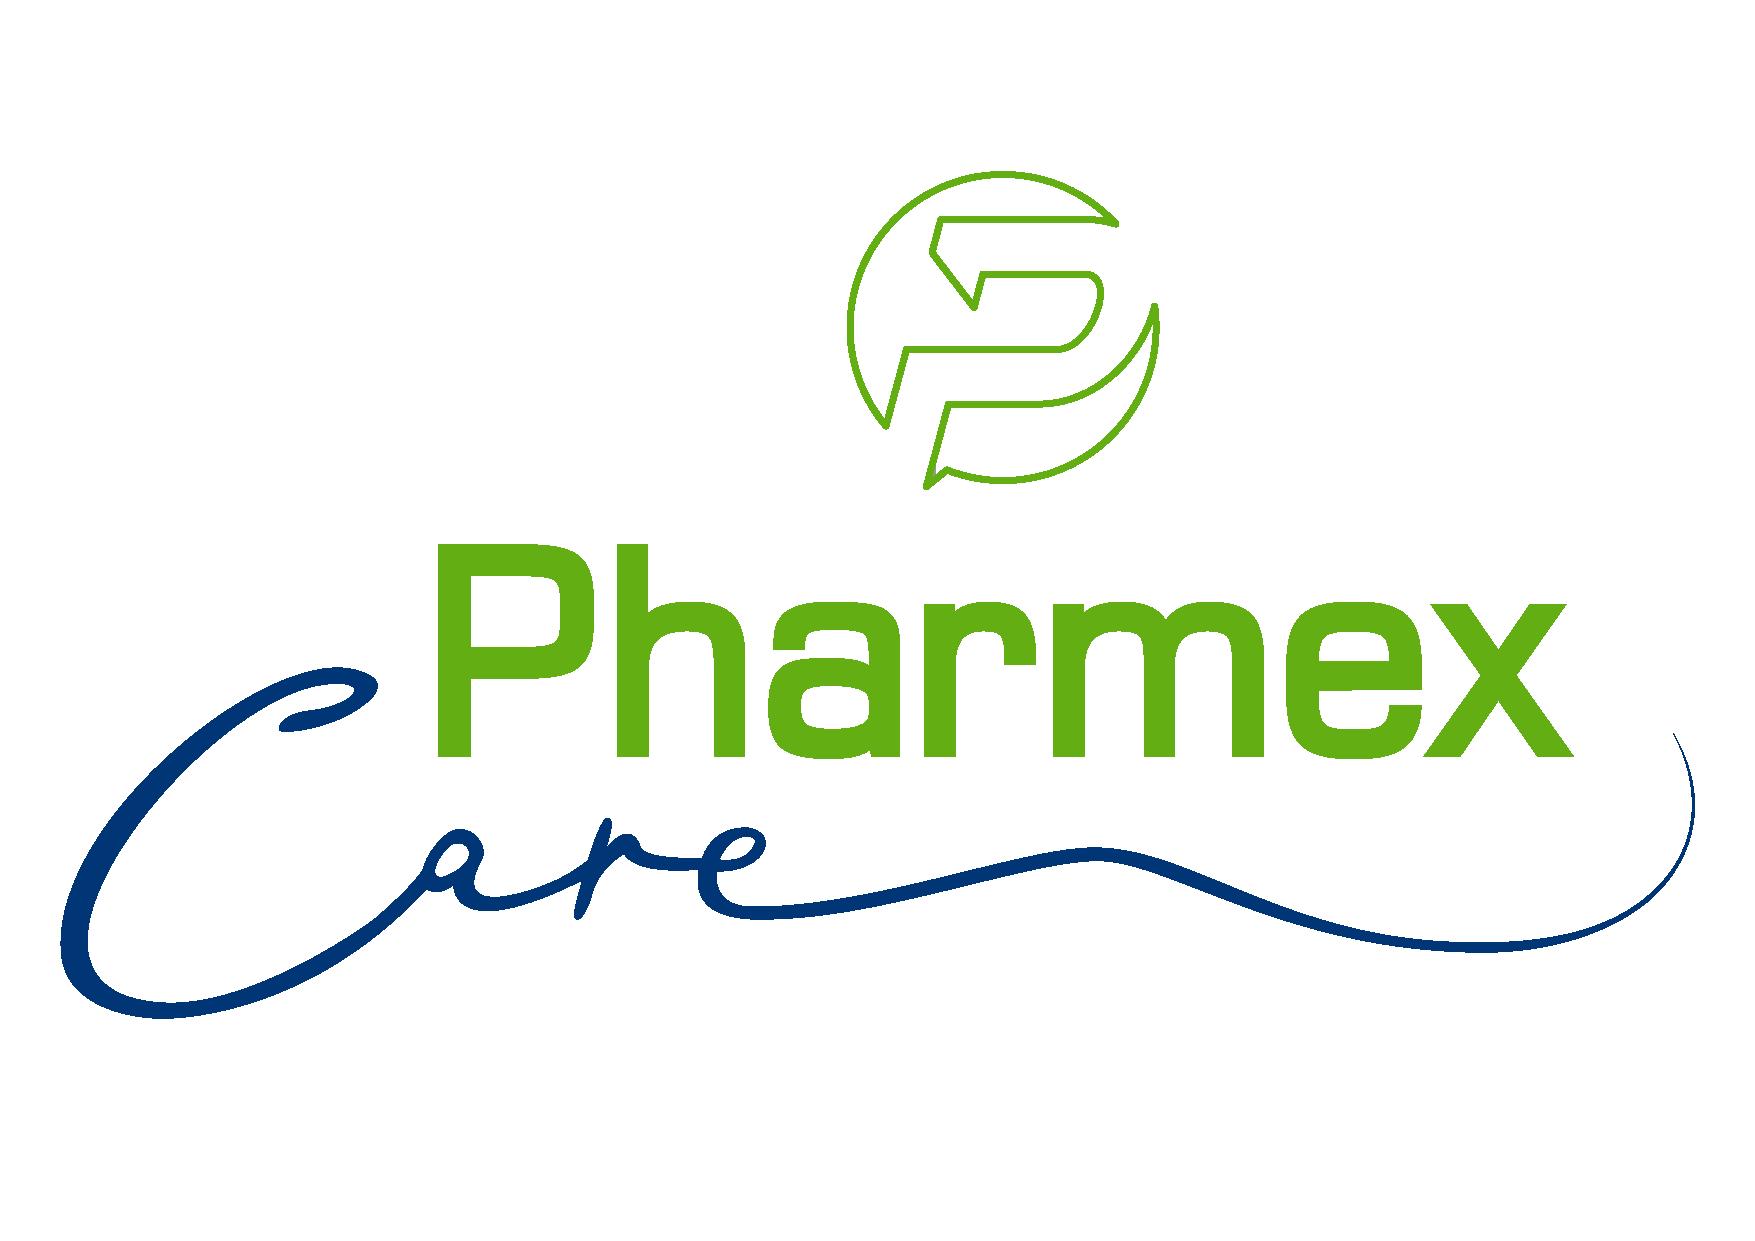 Pharmex Care